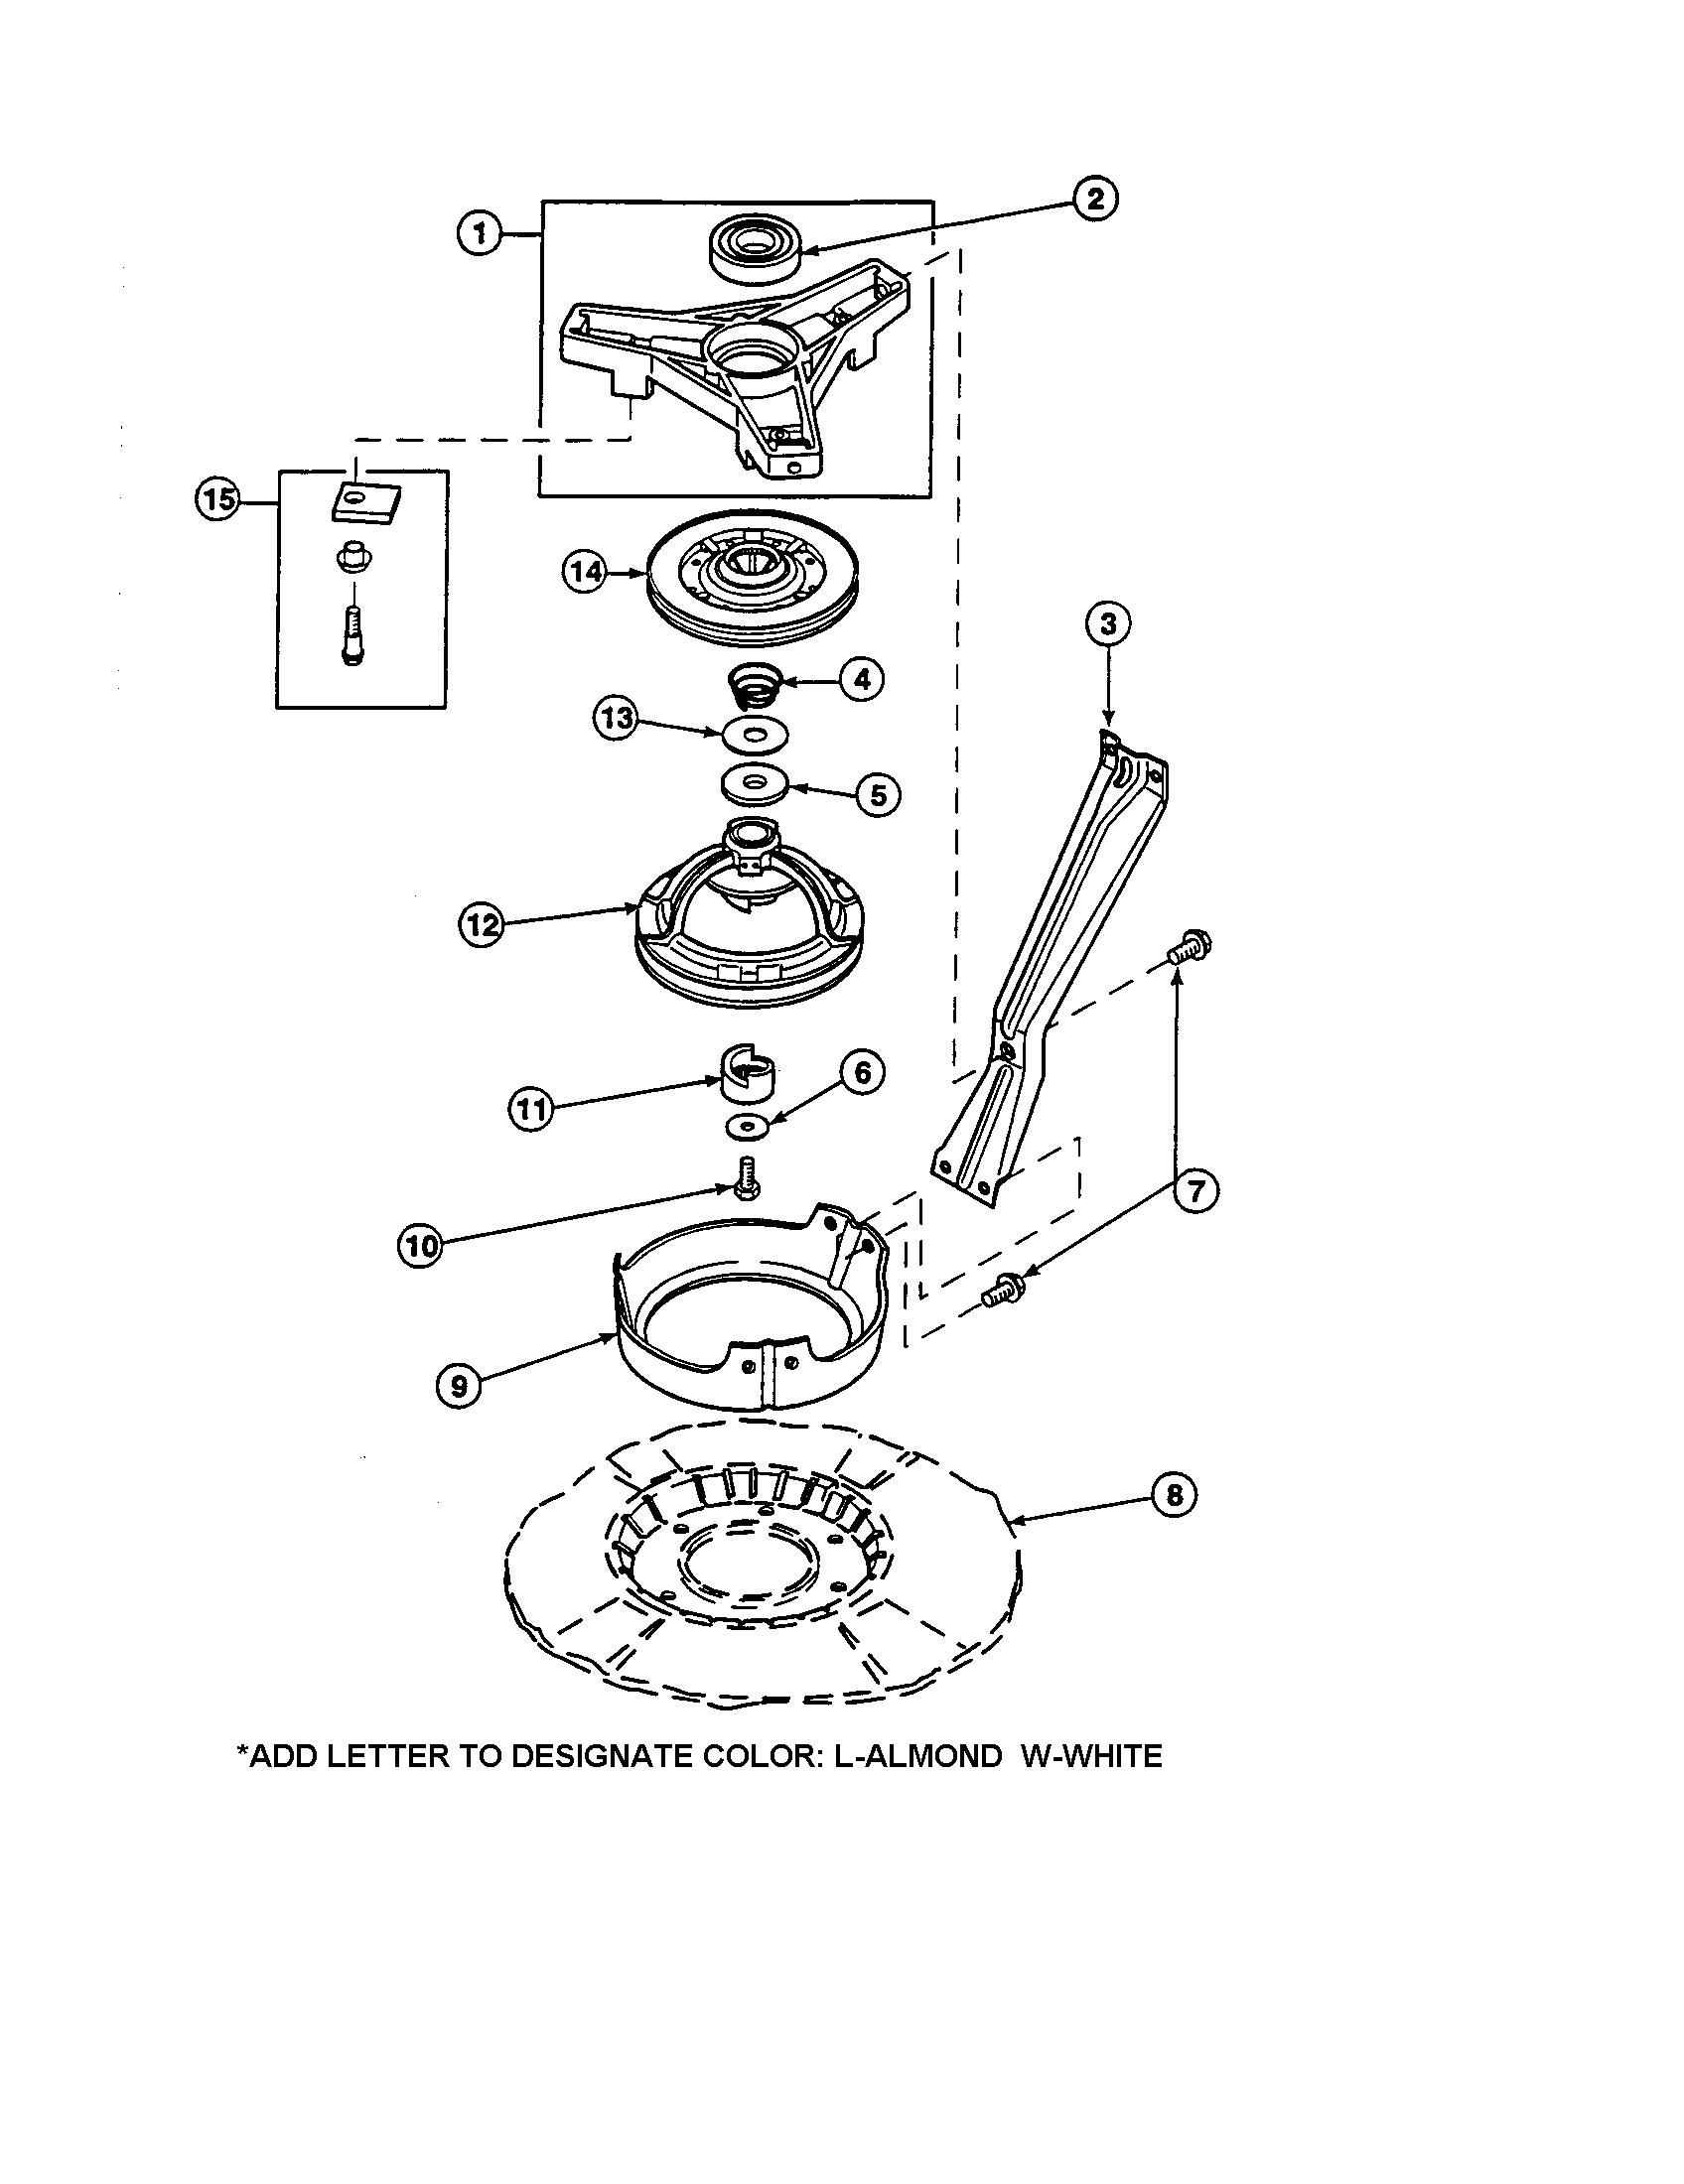 hight resolution of amana lw6153wm plw6153wmb bearing housing brake pulley diagram